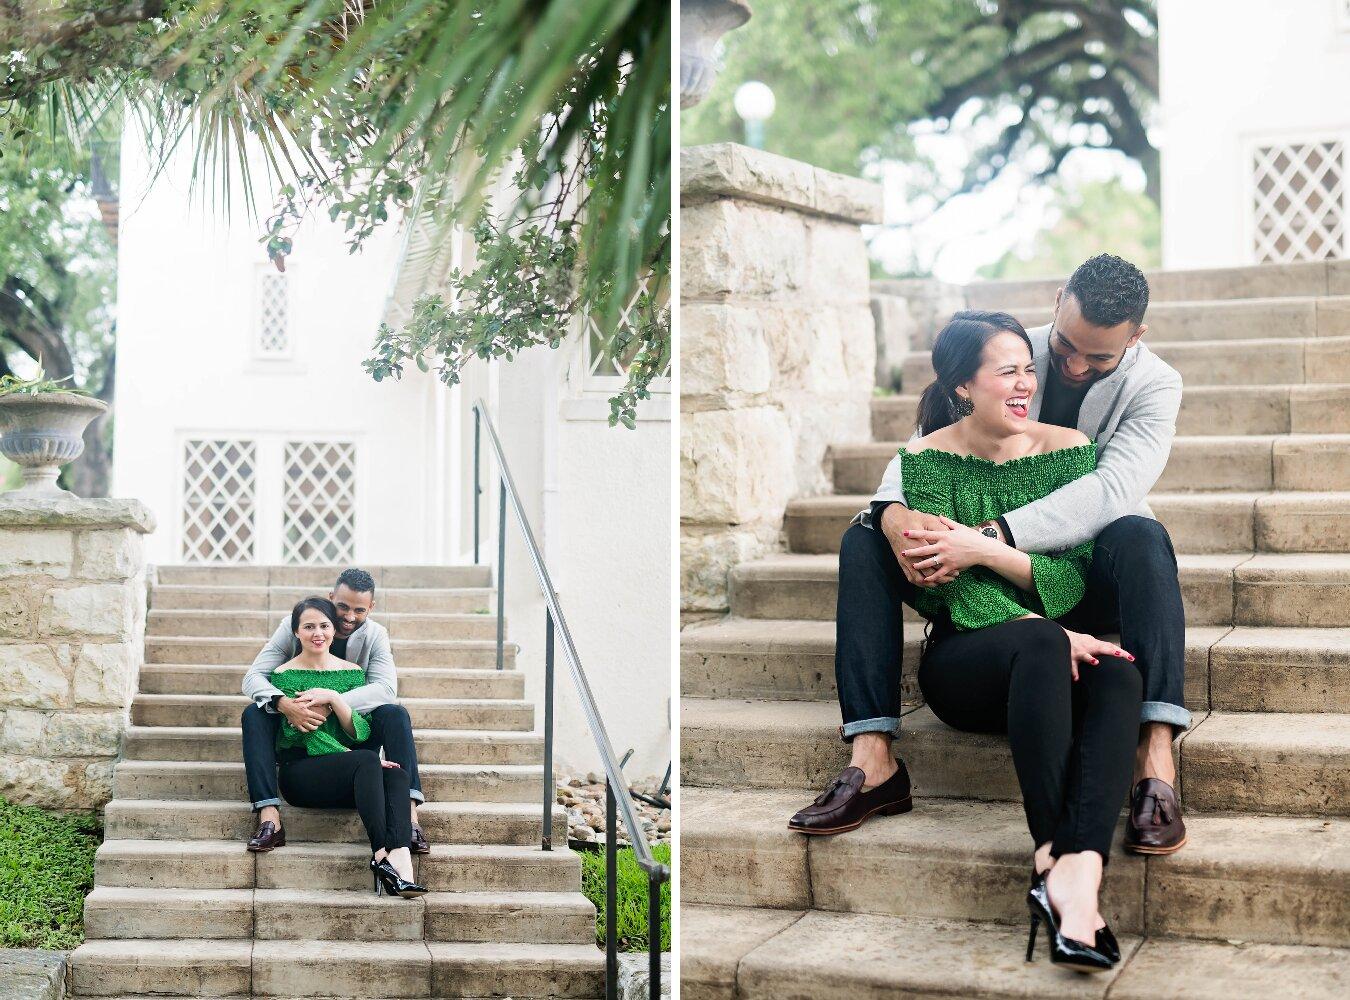 Austin Engagement- Pharris Photography- Engagement Session- The Contemporary Austin- Laura + Phil